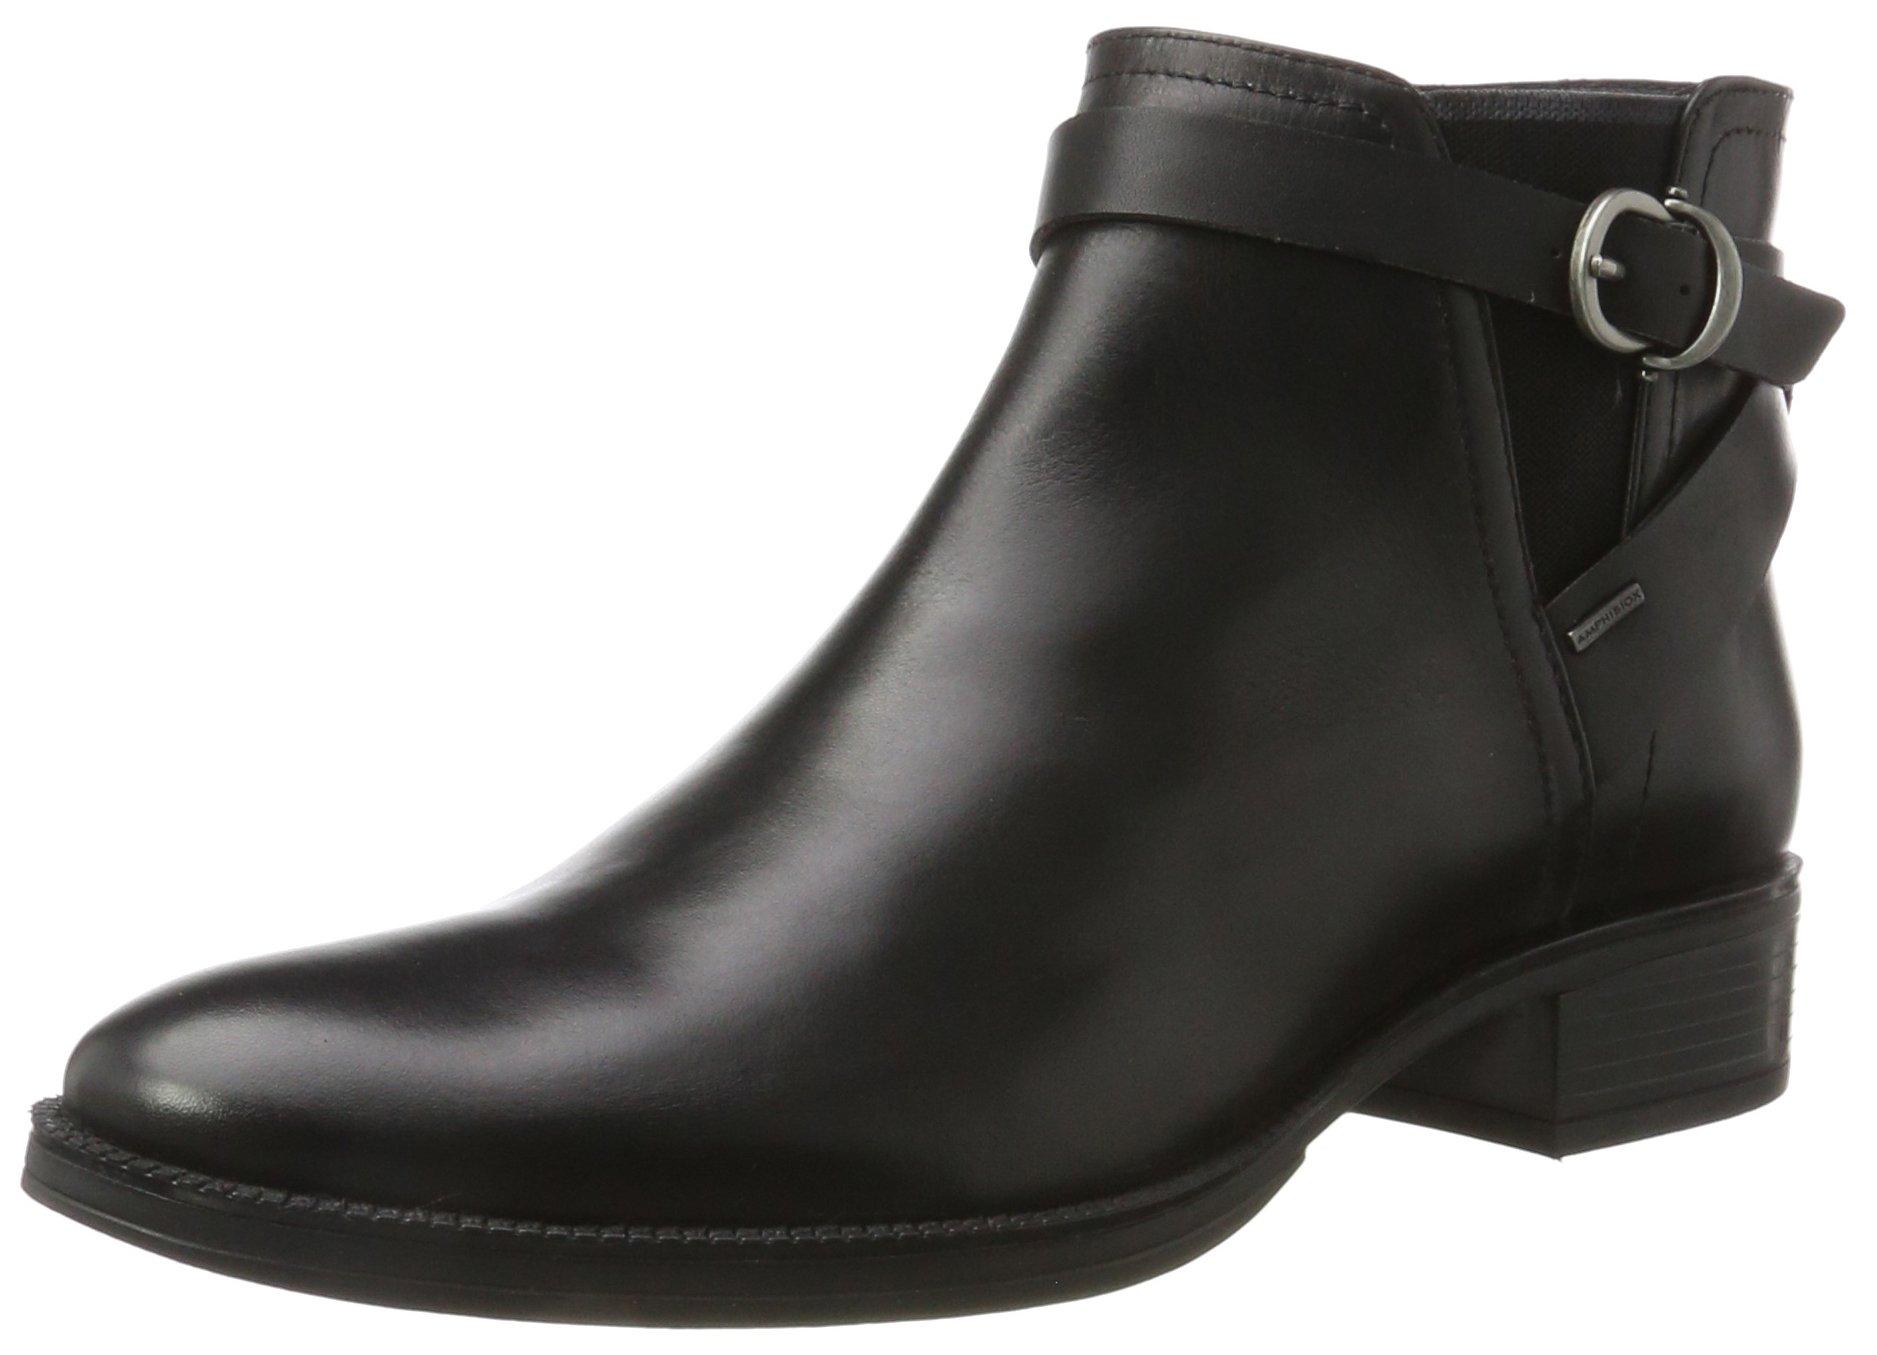 Geox Women's Mendi NP ABX 3 Ankle Bootie, Black, 38 EU/8 M US